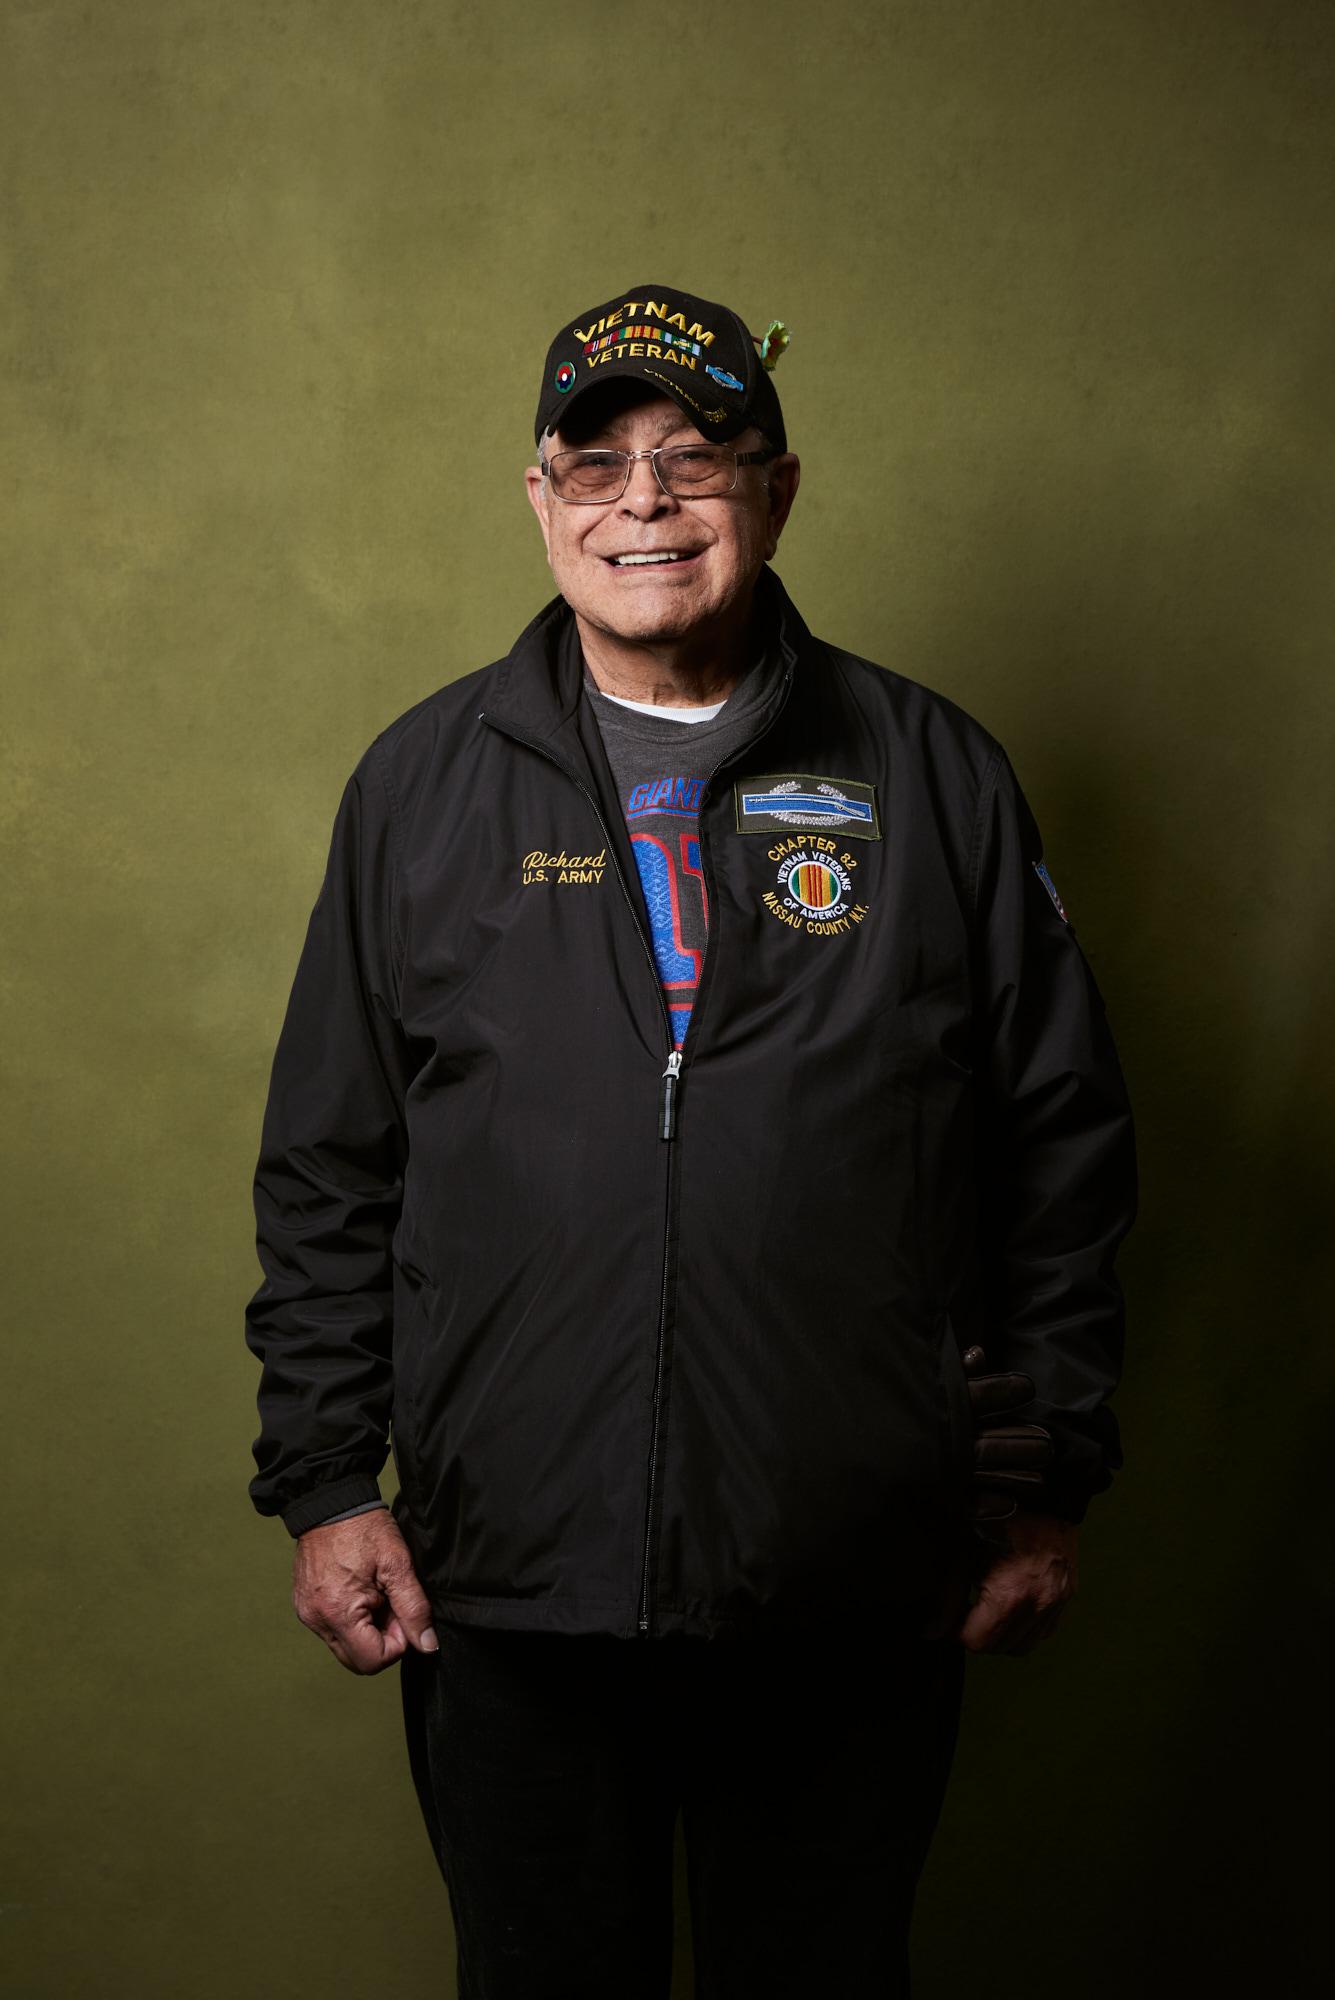 Sergeant Richard Guevara